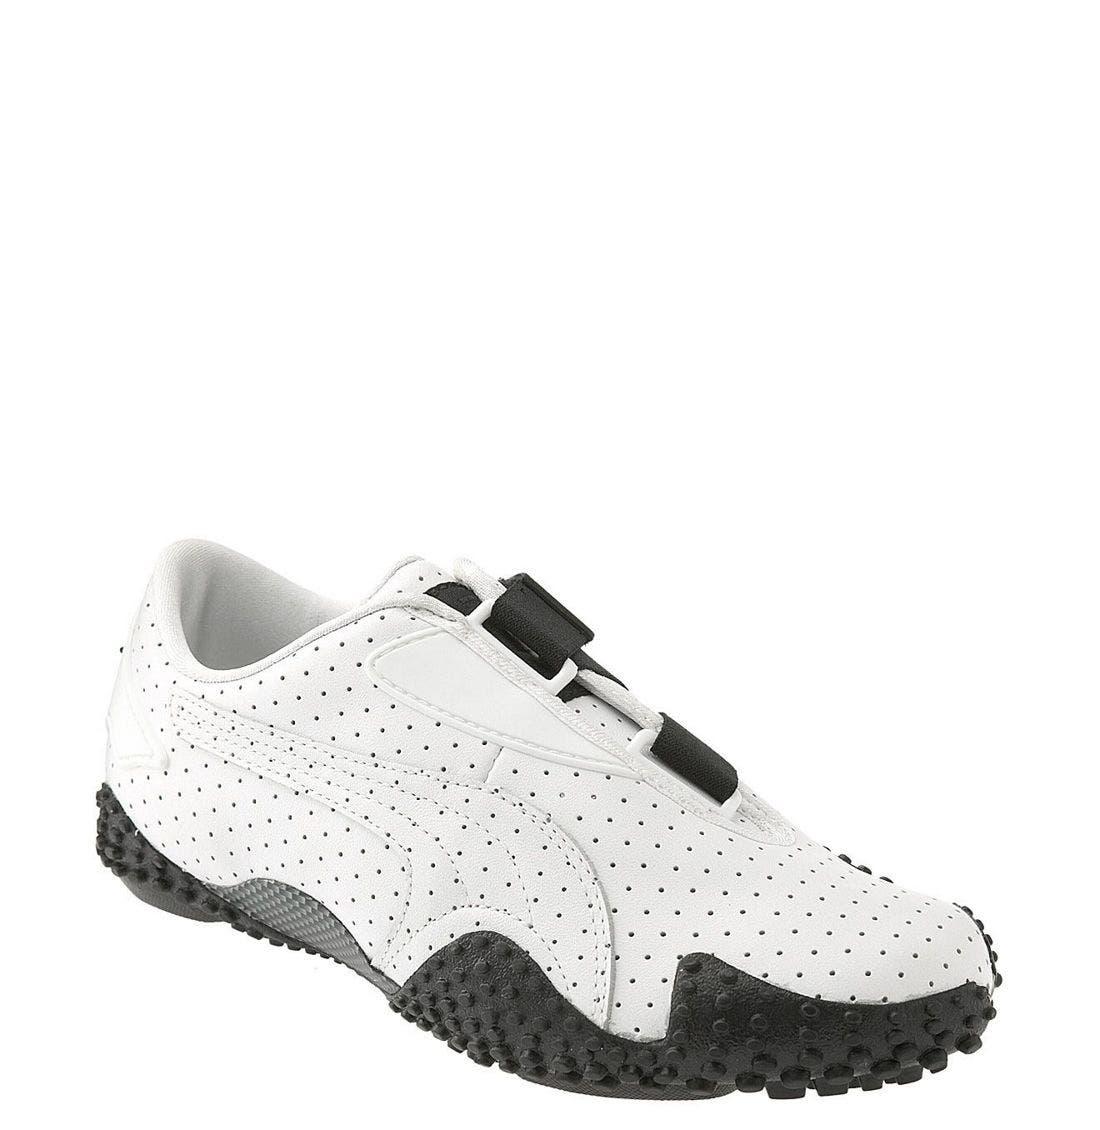 Alternate Image 1 Selected - PUMA 'Mostro Perf' Sneaker (Women)